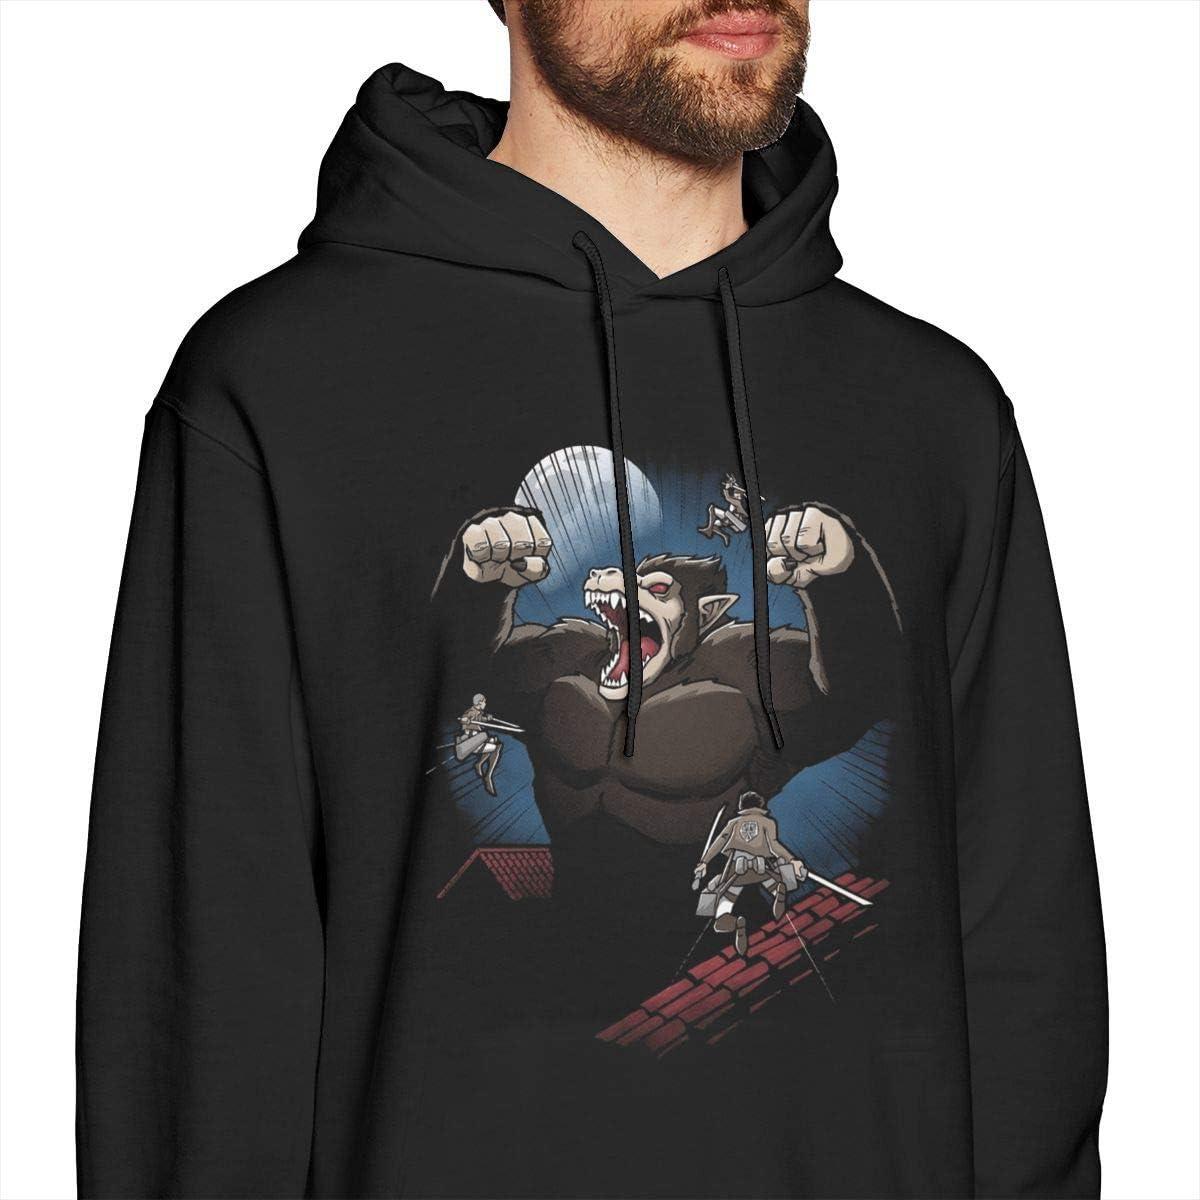 Attack On Titan Shirt Split Herren Pullover Hoodies Rundhals-Langarm-Sweatshirt Schwarz X-large style2